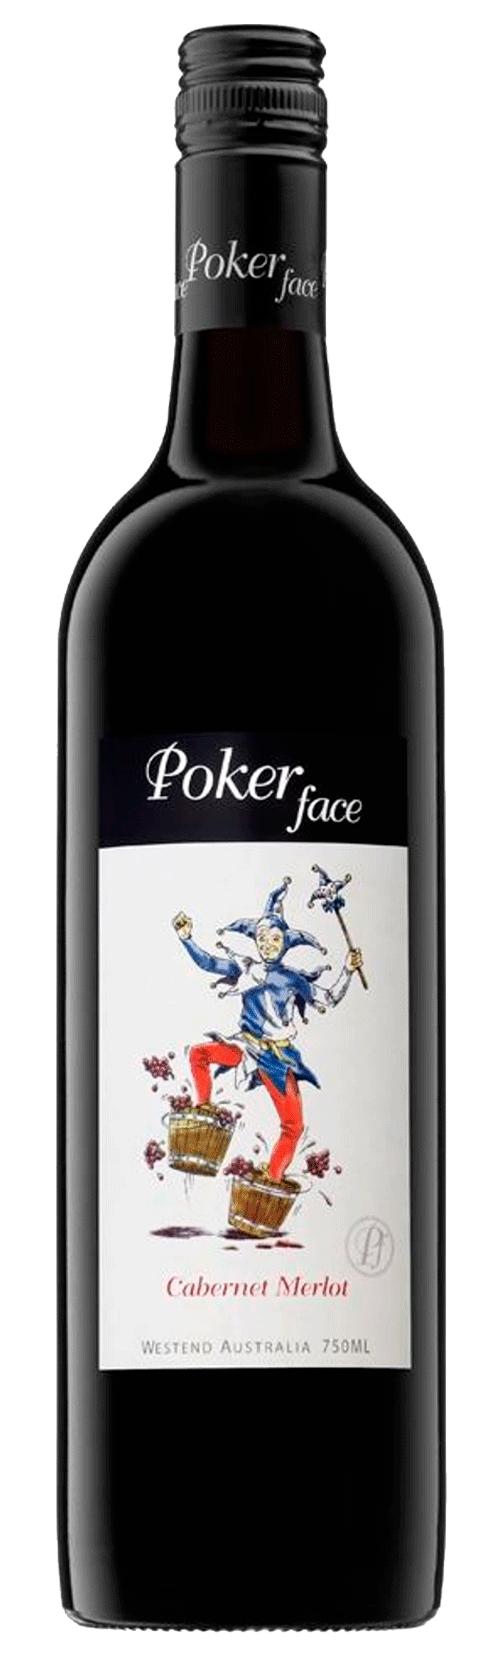 Poker Face Cabernet Merlot 2011